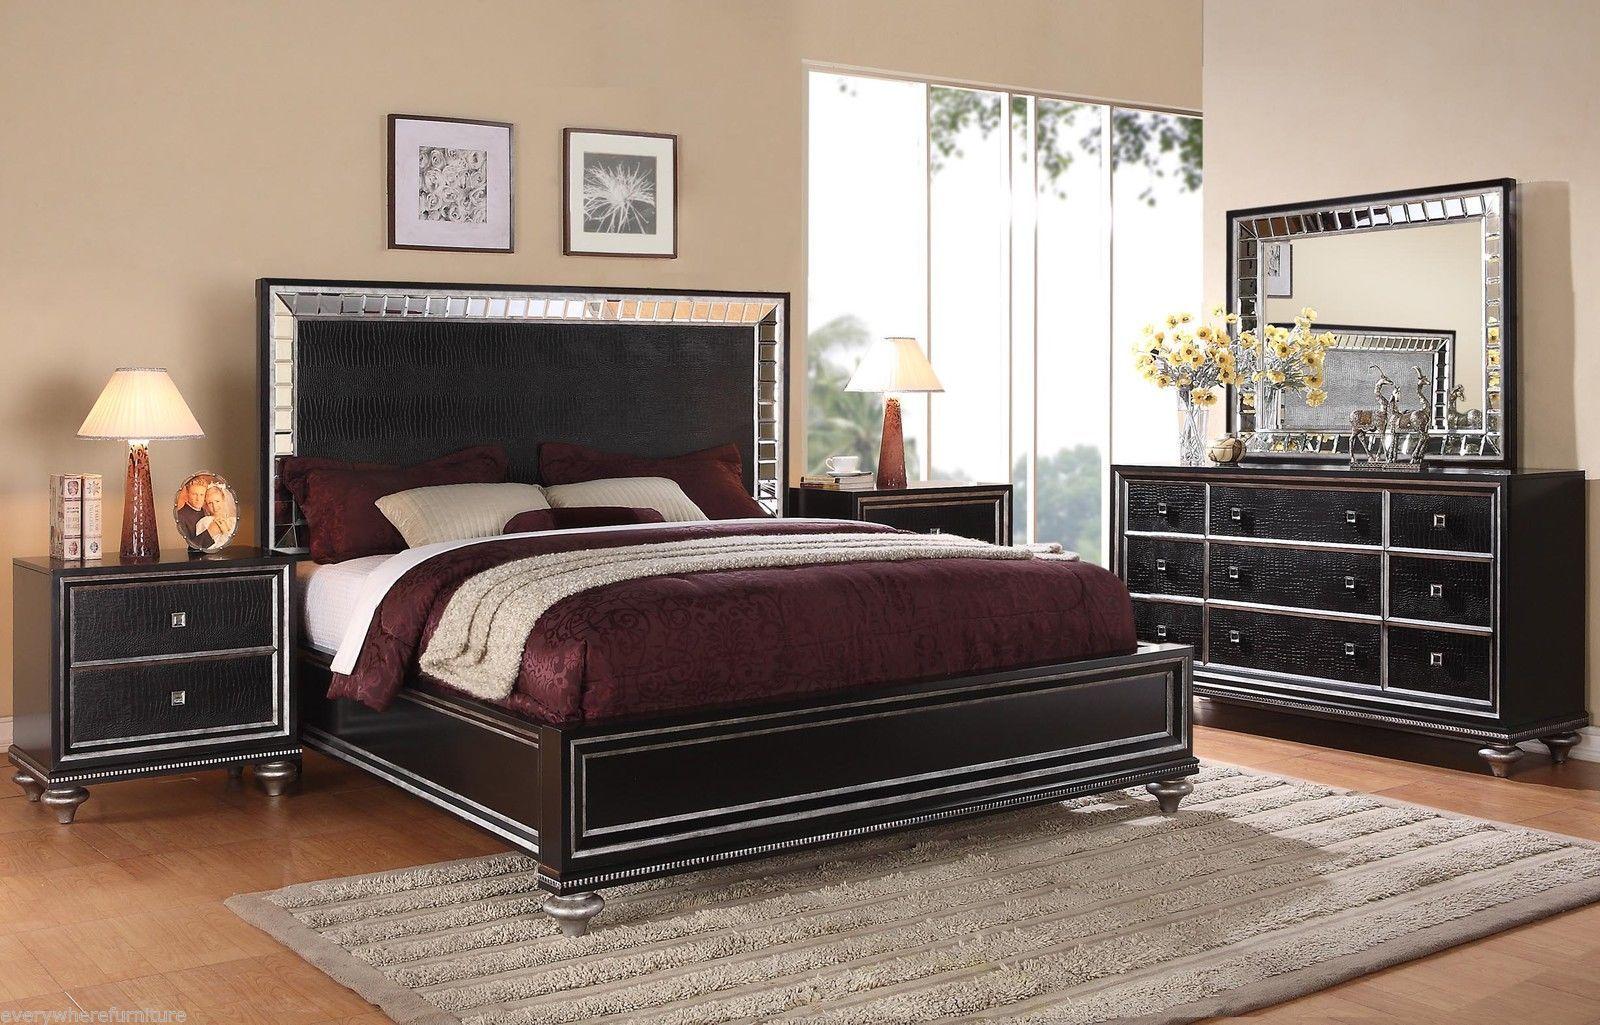 Wynwood Glam Black Mirrored King Size Mansion Bed Bedroom Furniture Hollywood King Size